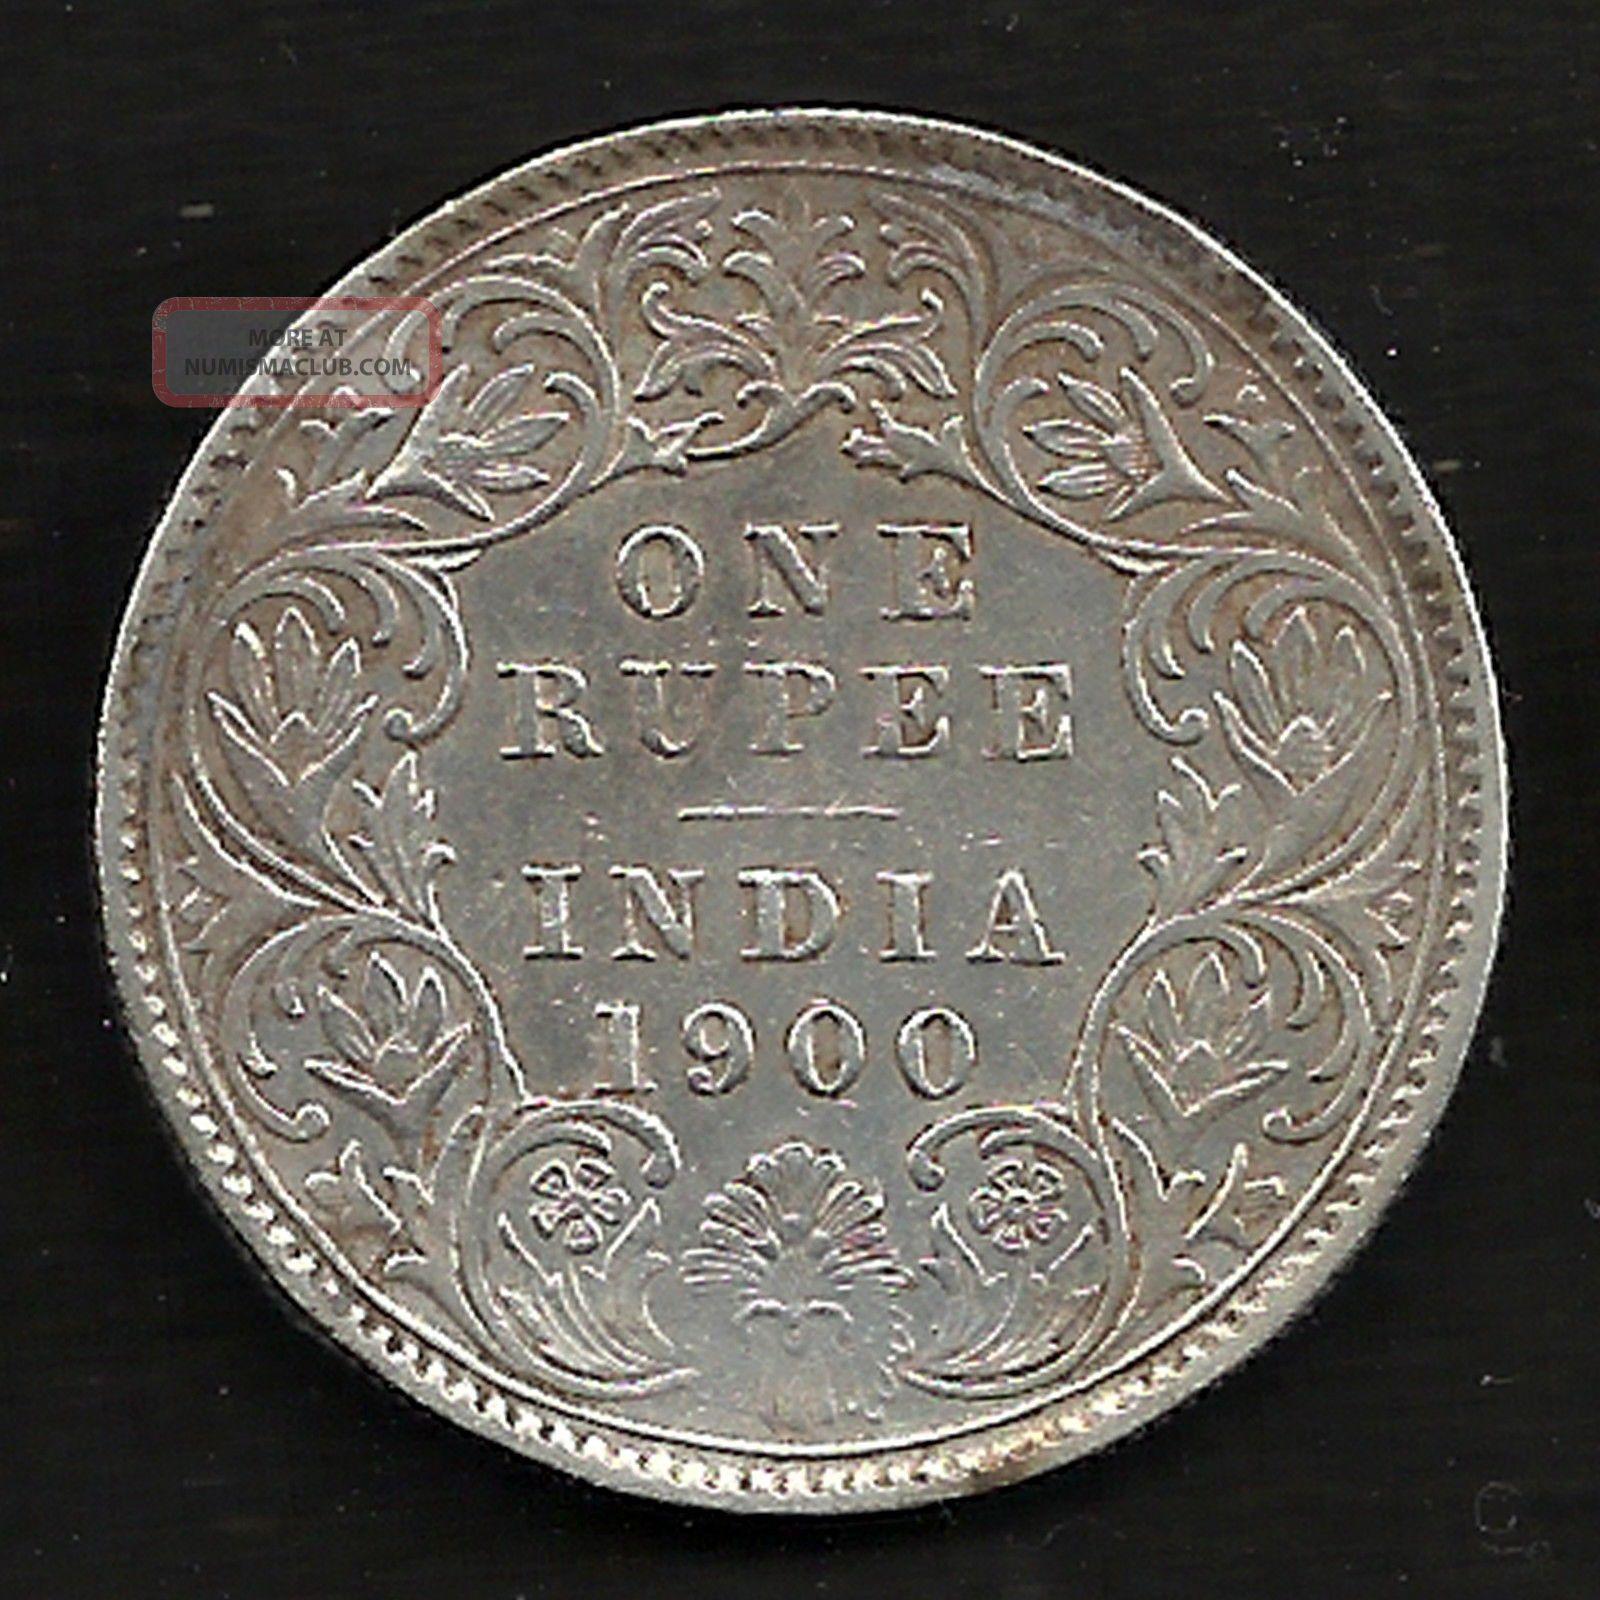 British India - 1900 - Victoria Empress - One Rupee - Ex Rarest Silver Coin India photo